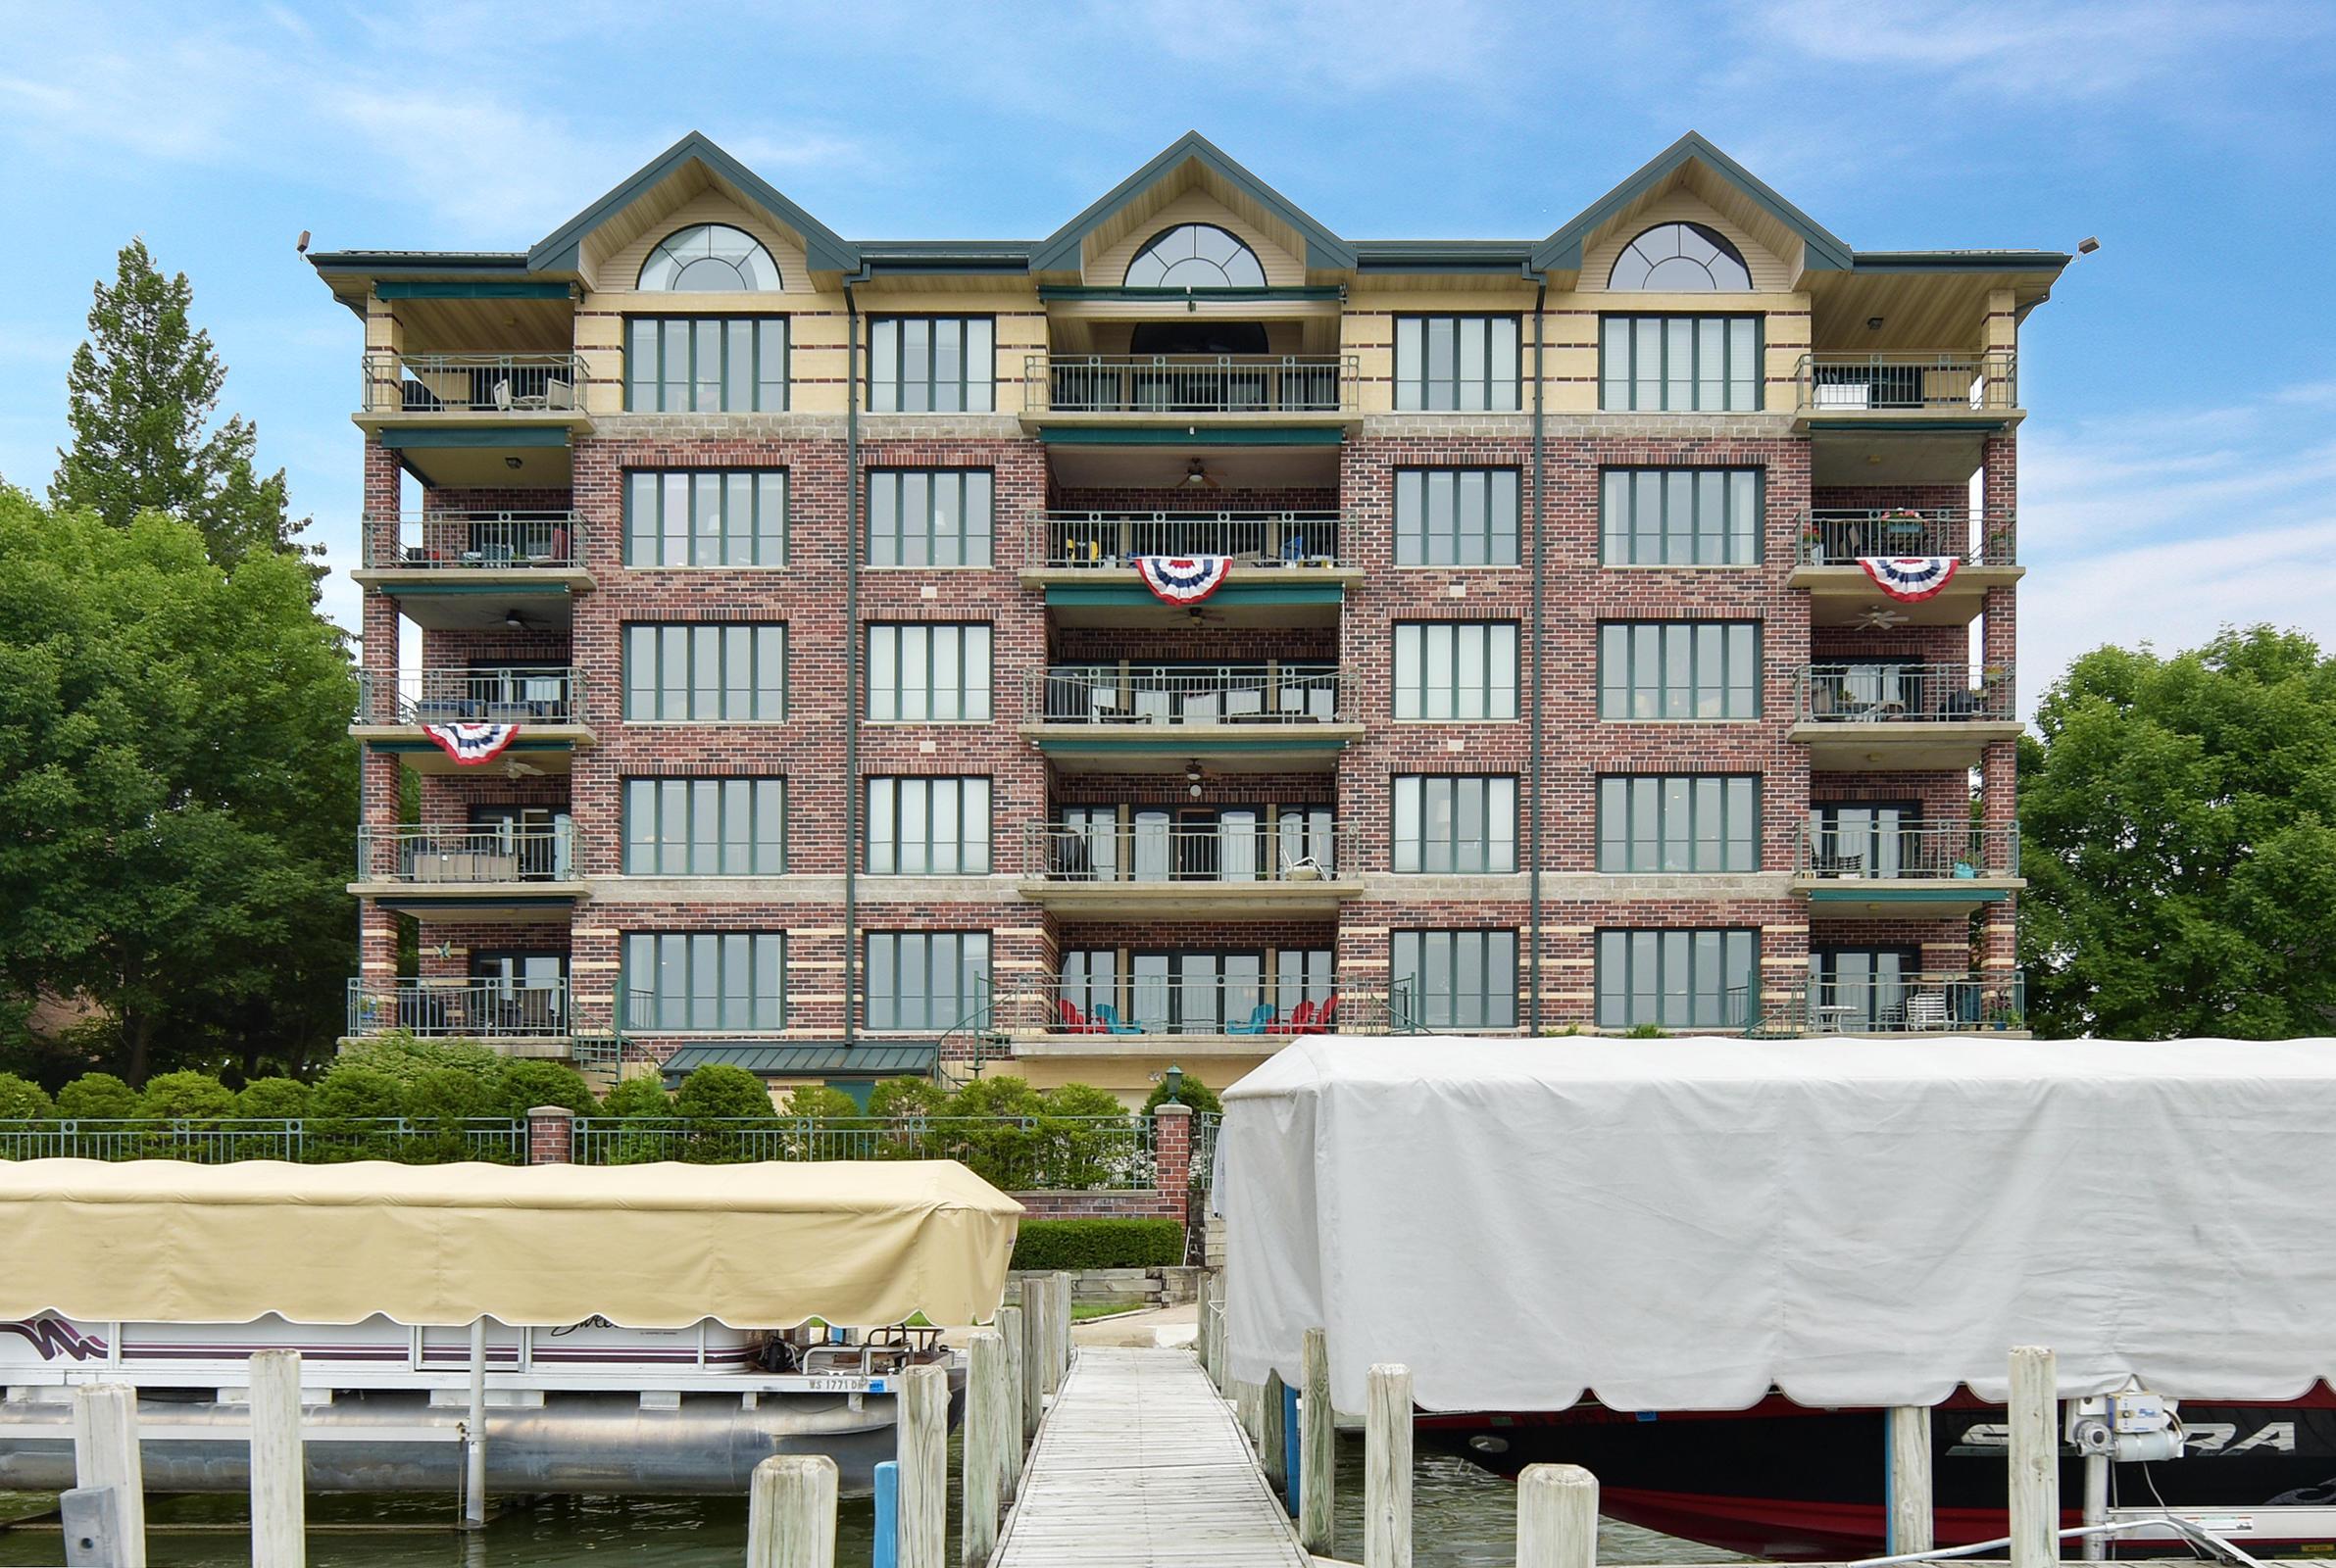 318 Lake Rd, Oconomowoc, Wisconsin 53066, 3 Bedrooms Bedrooms, 7 Rooms Rooms,2 BathroomsBathrooms,Condominiums,For Sale,Lake Rd,3,1602217